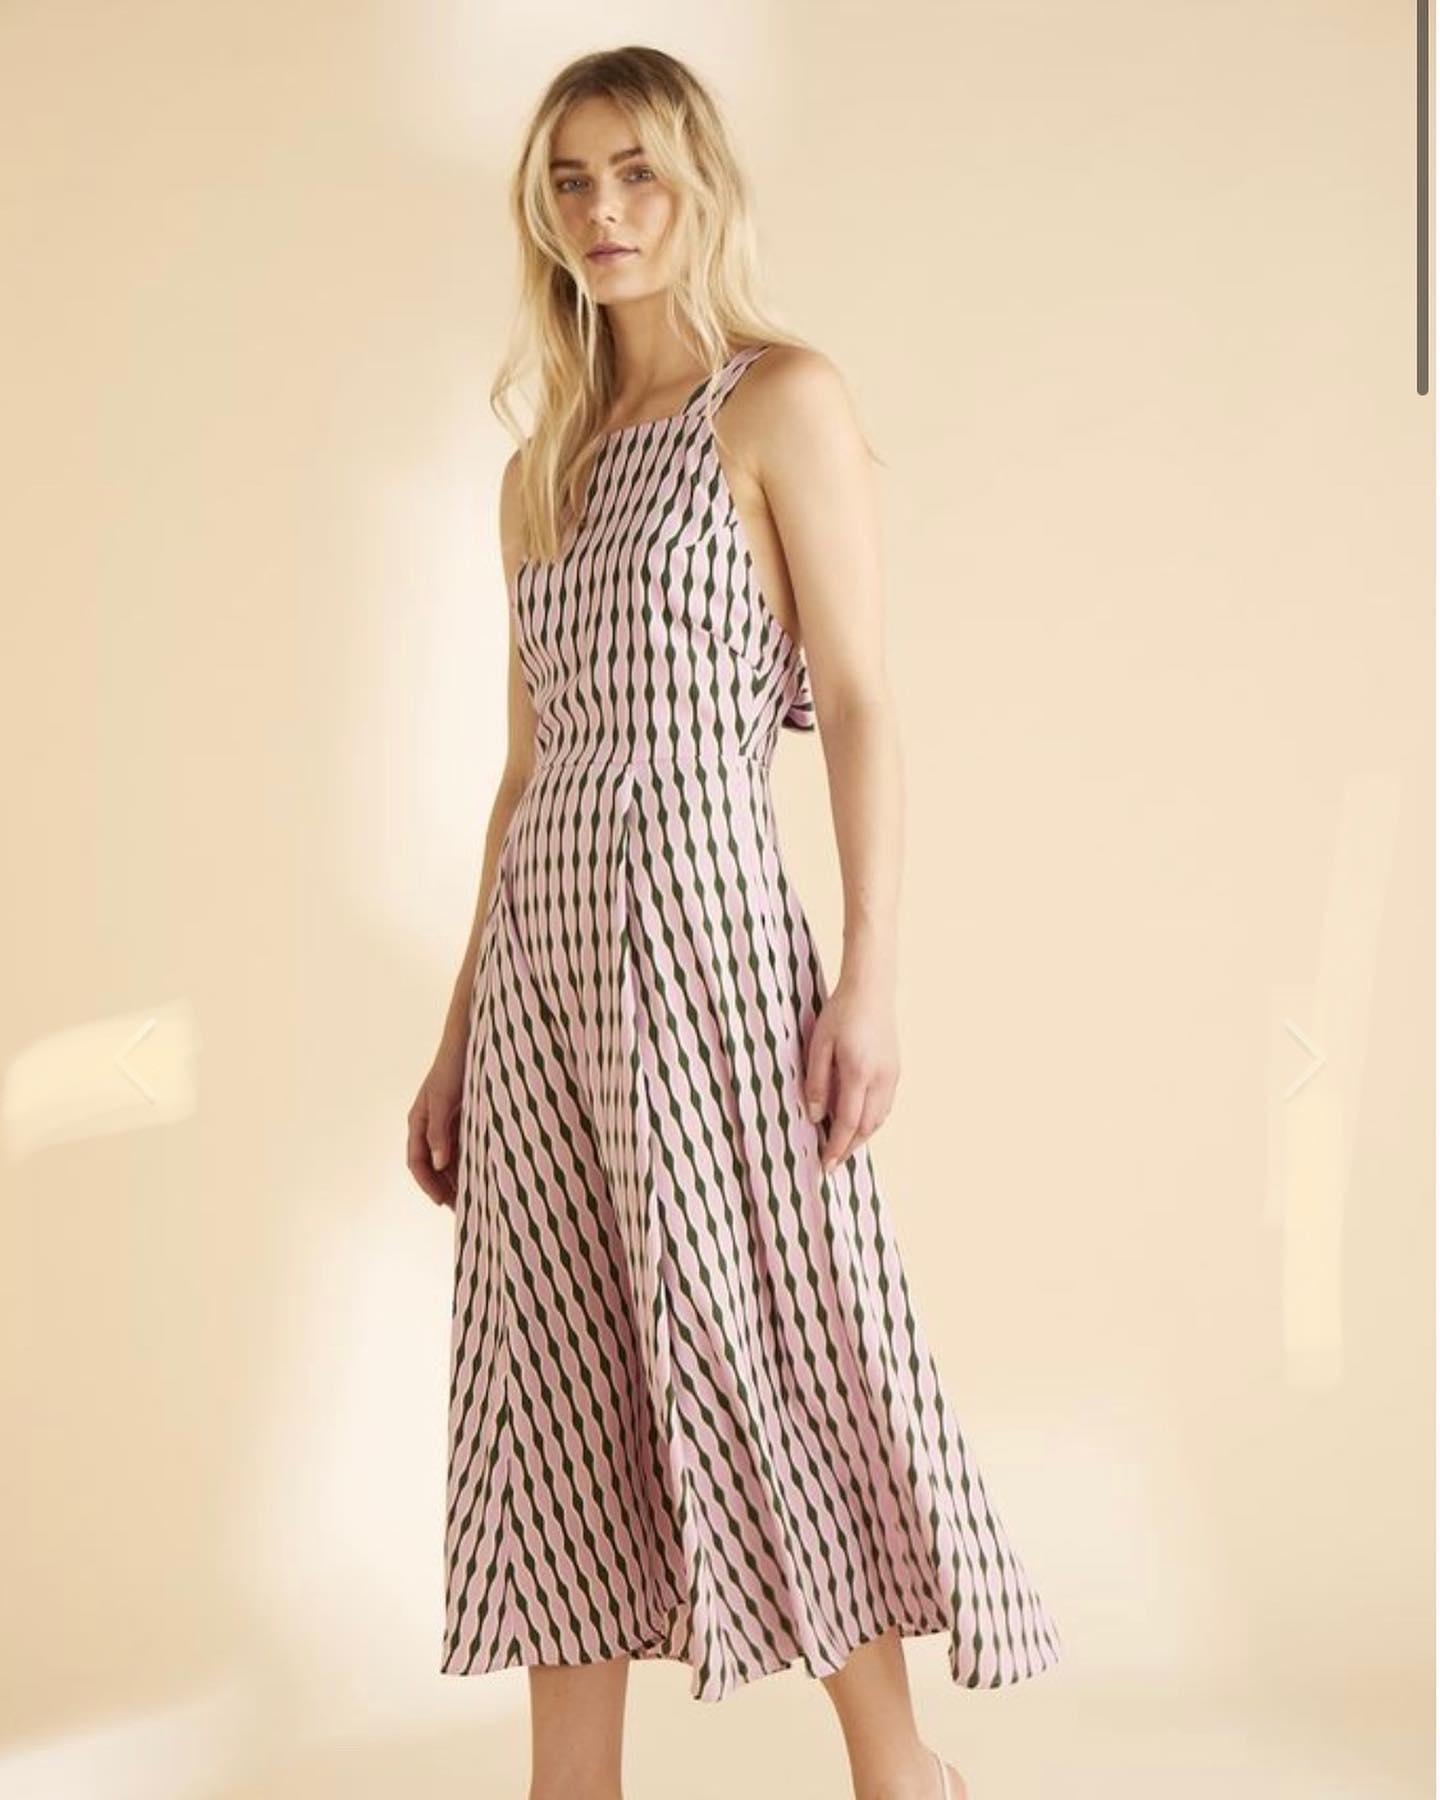 Wobble Apron Sun Dress